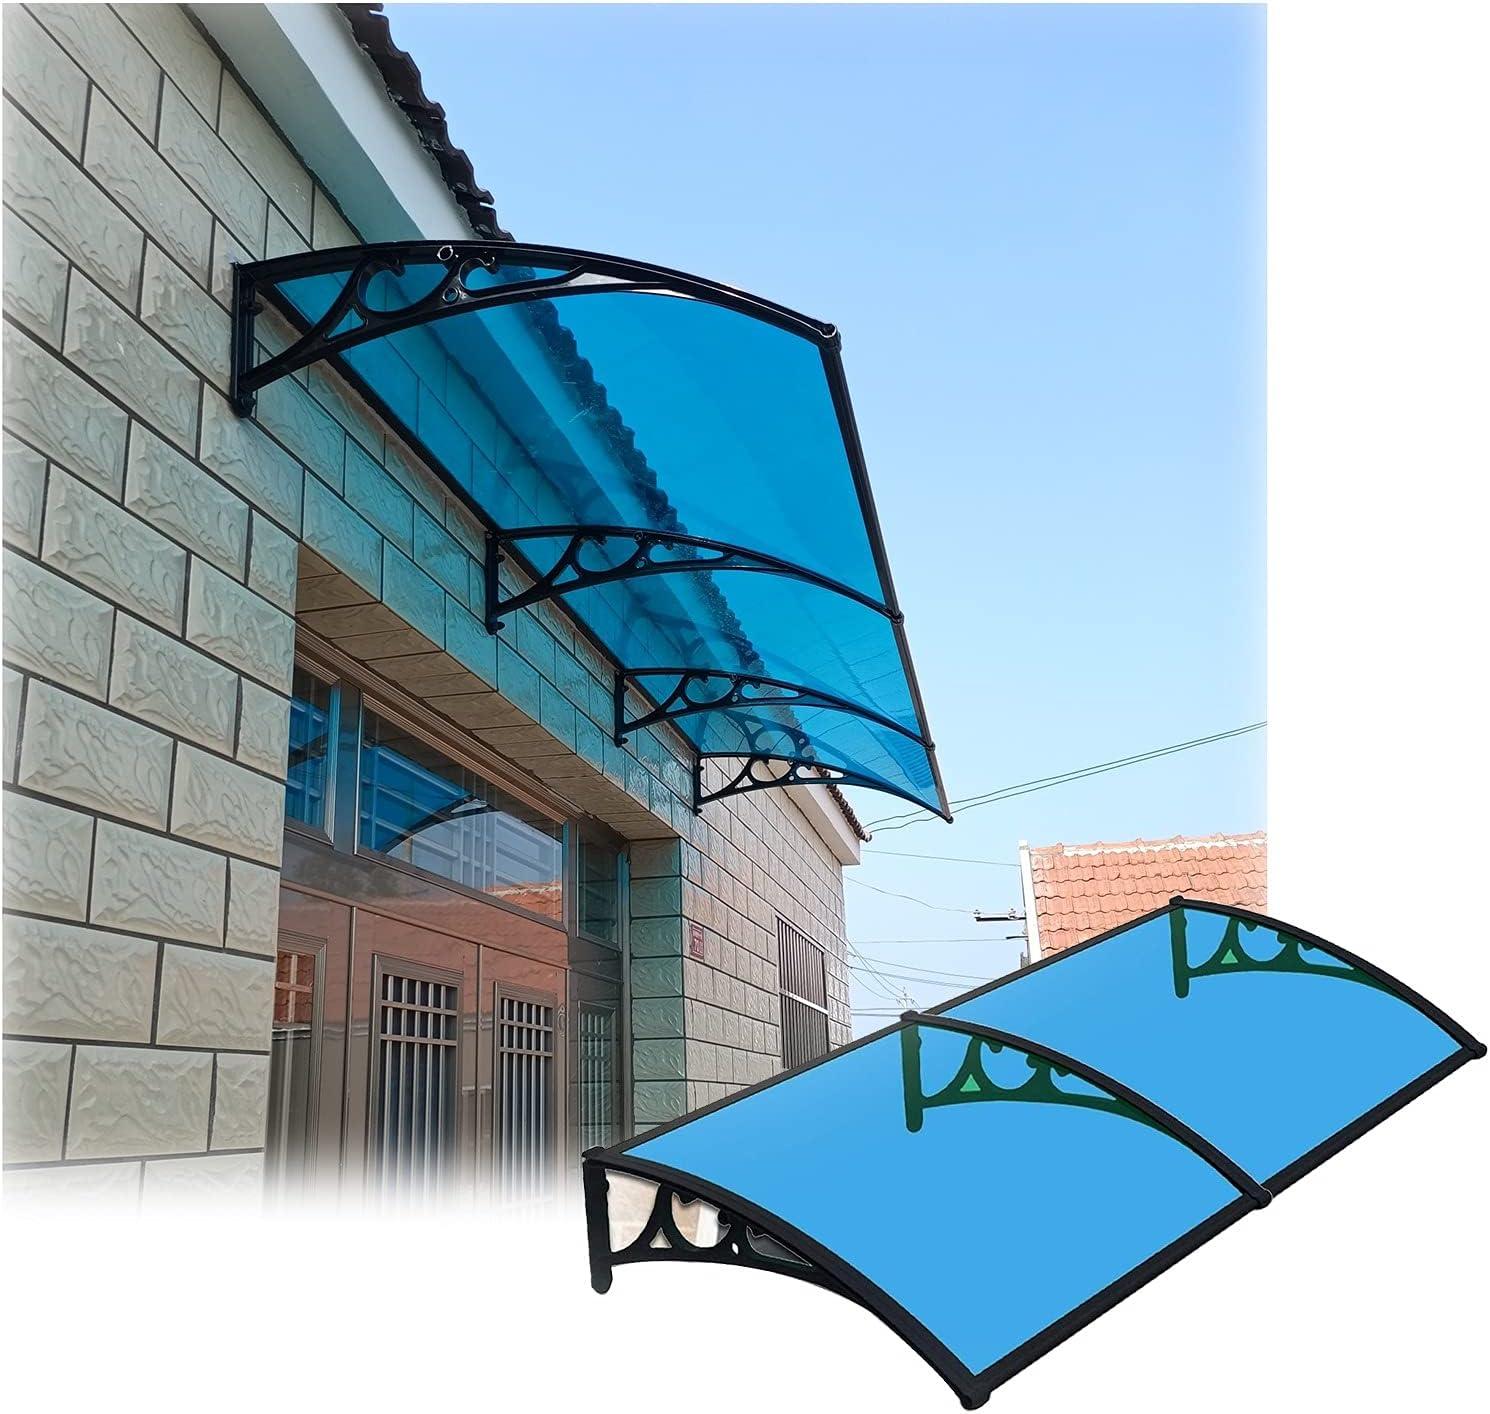 JIANFEI Outdoor Ranking TOP17 Door Window Nashville-Davidson Mall Canopy Awning Translucent Polycarbo